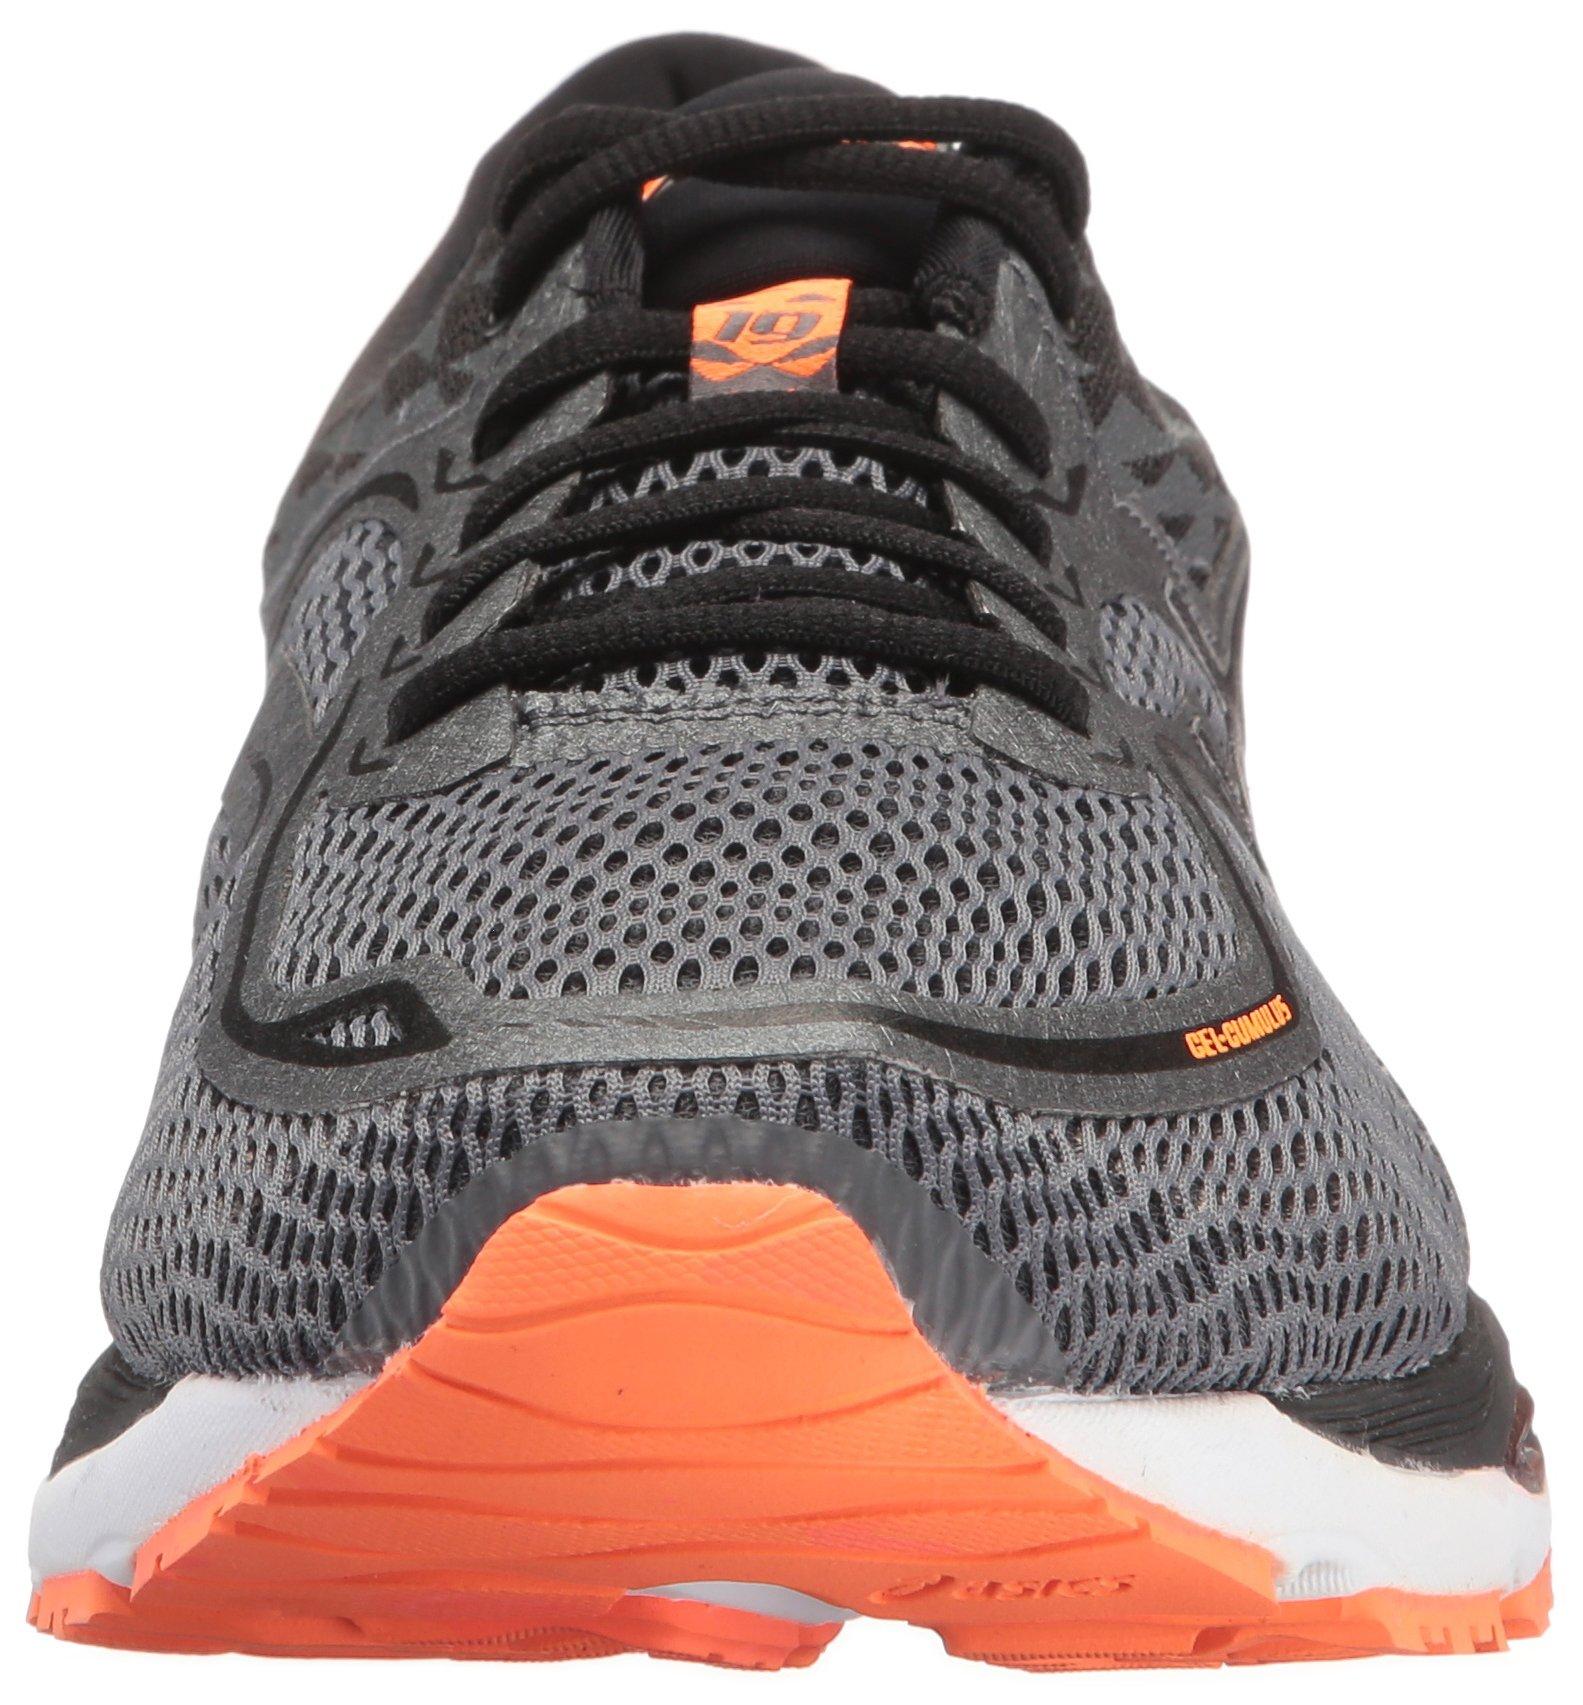 ASICS Mens Gel-Cumulus 19 Running Shoe, Carbon/Black/Hot Orange, 6.5 Medium US by ASICS (Image #4)